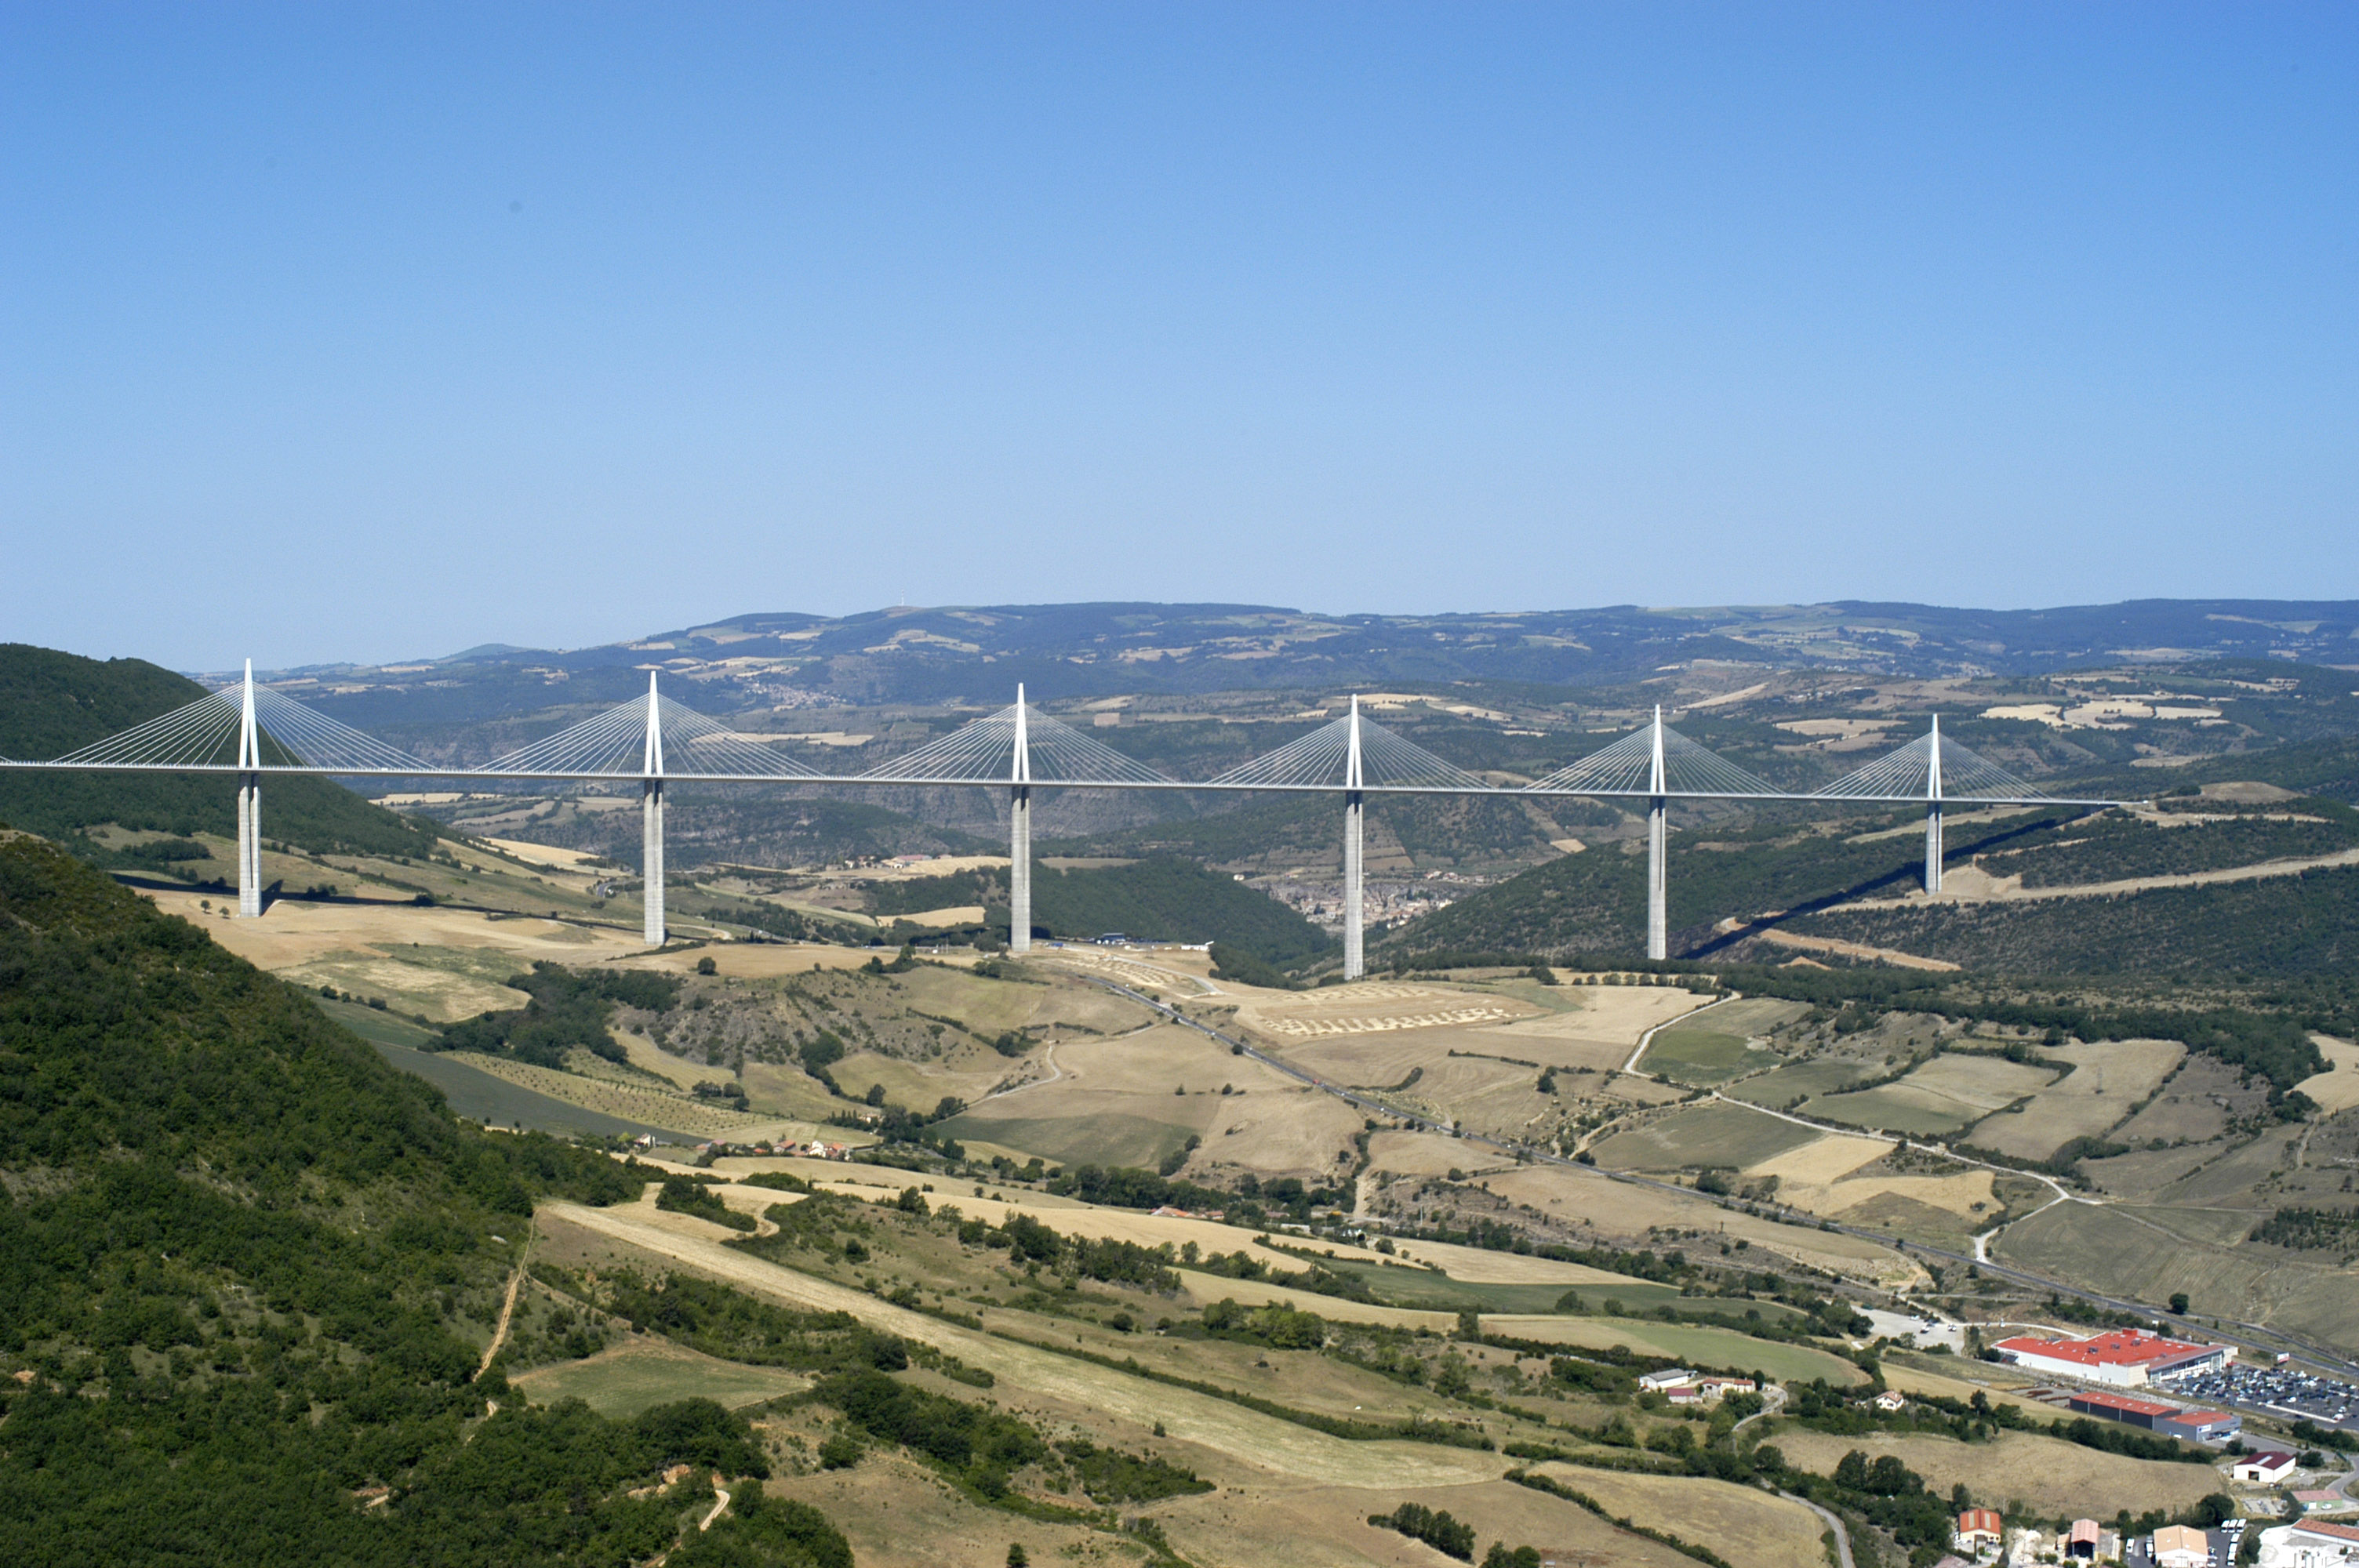 Pin Millau Viaduct France 2011 Hd 1080p on Pinterest